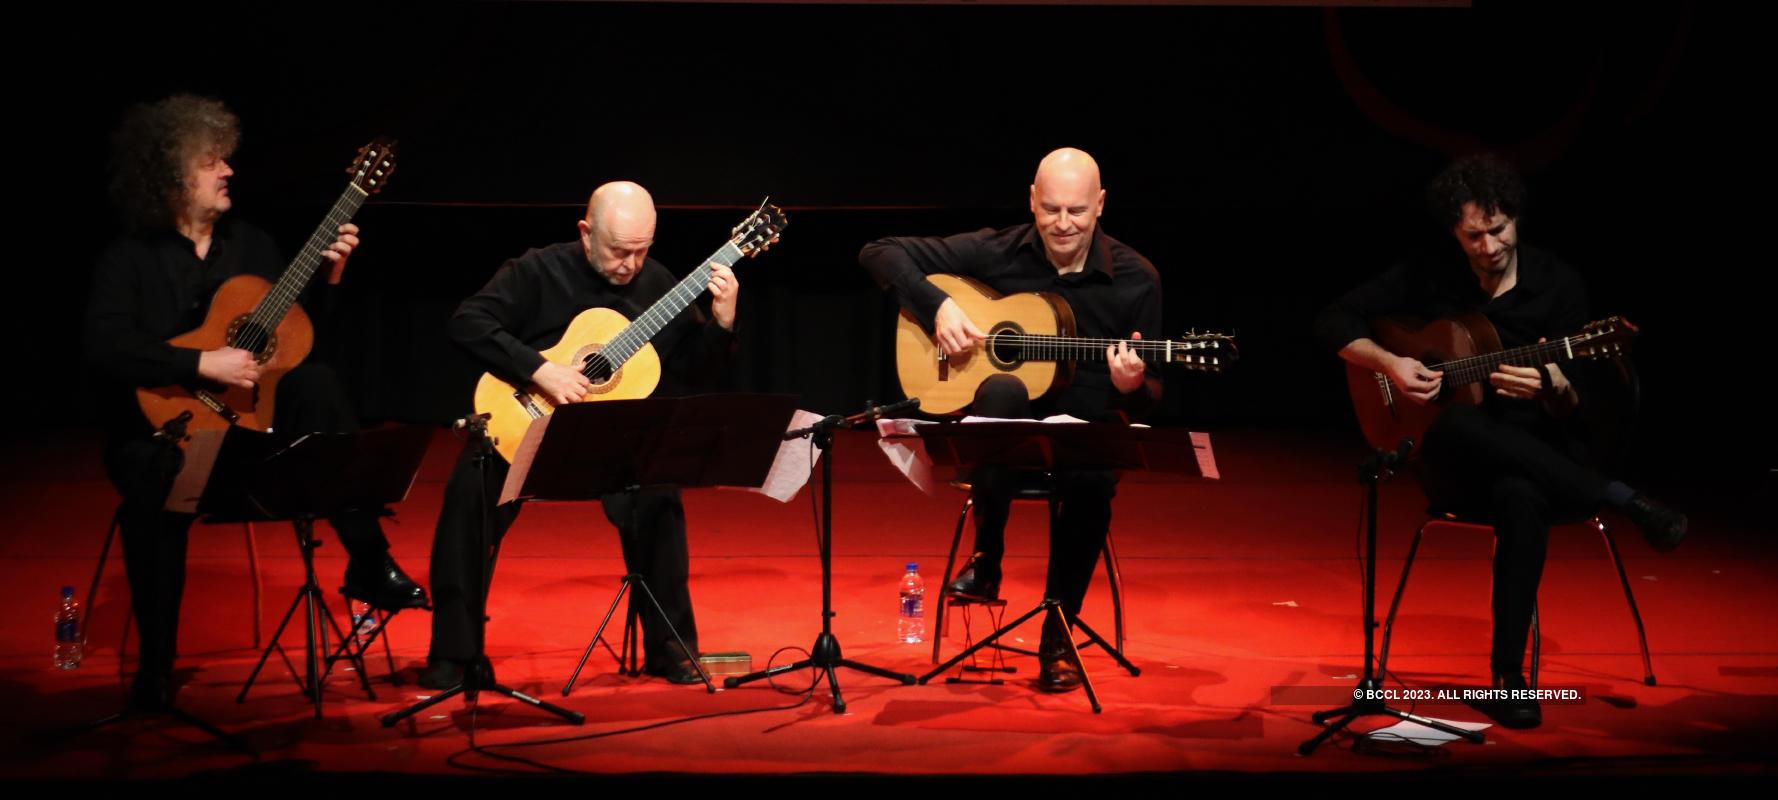 Kolkata celebrated the 10th edition of the Calcutta International Classical Guitar Festival